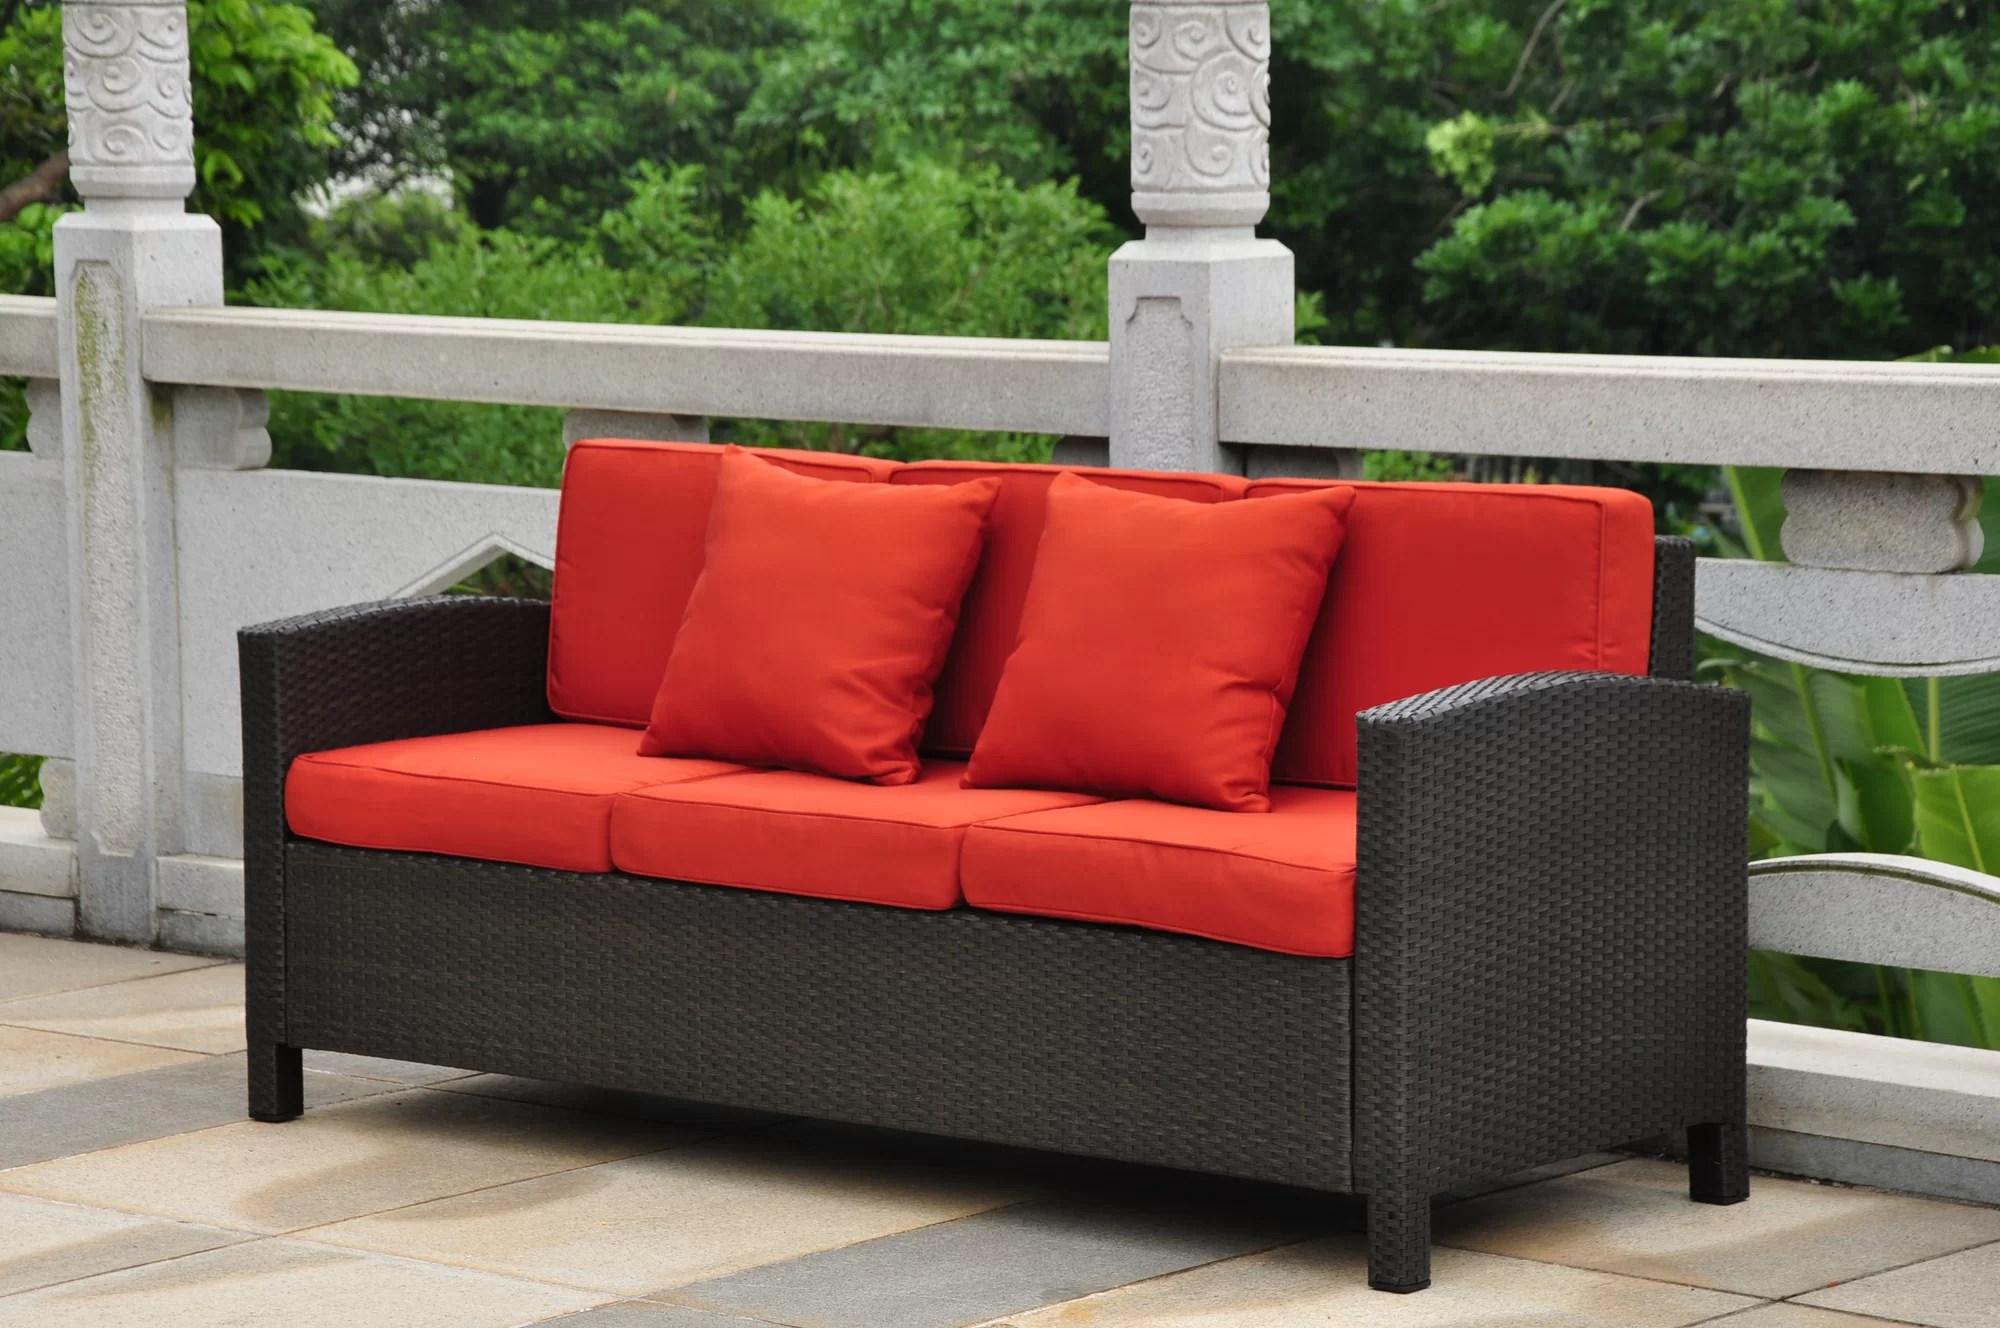 outdoor wicker sofa cushions baby singapore barcelona resin aluminum patio with